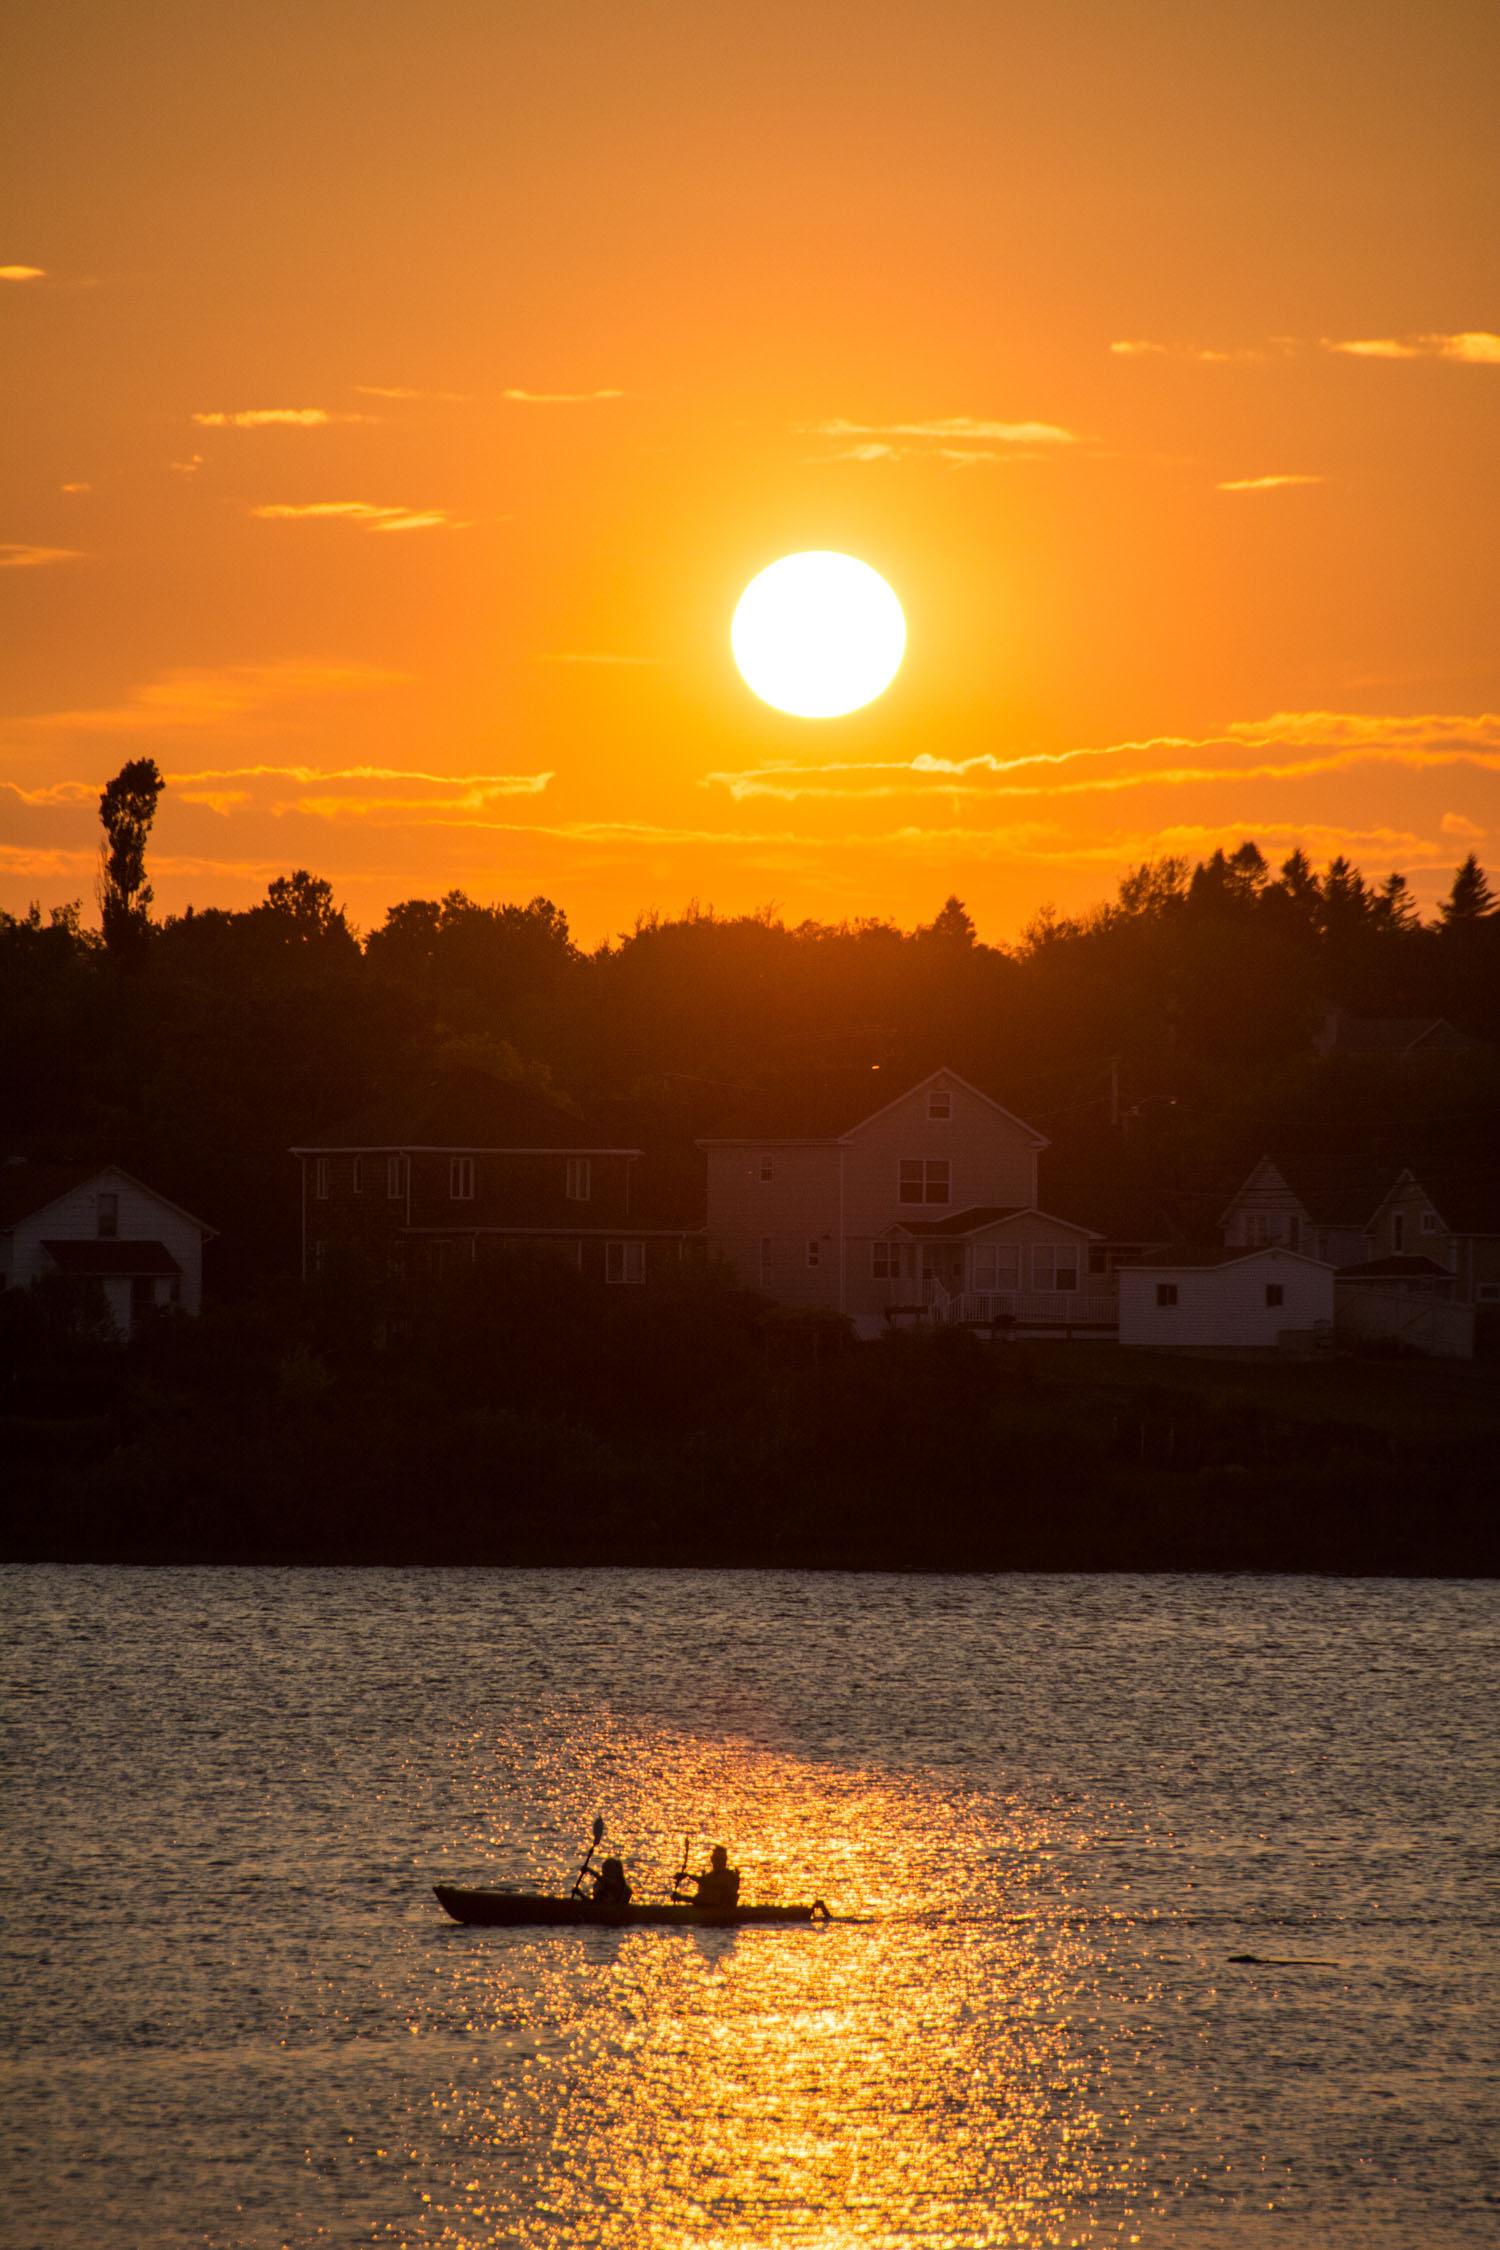 aug10-15 2014-Tourism New Brunswick-T4G Kick-summer 2014-Miramichi-Bathurst-Caraquet-Shippagan-Miscou Island-NB-web res jpg-photo by Aaron McKenzie Fraser-www.amfraser.com_AMF1837.jpg